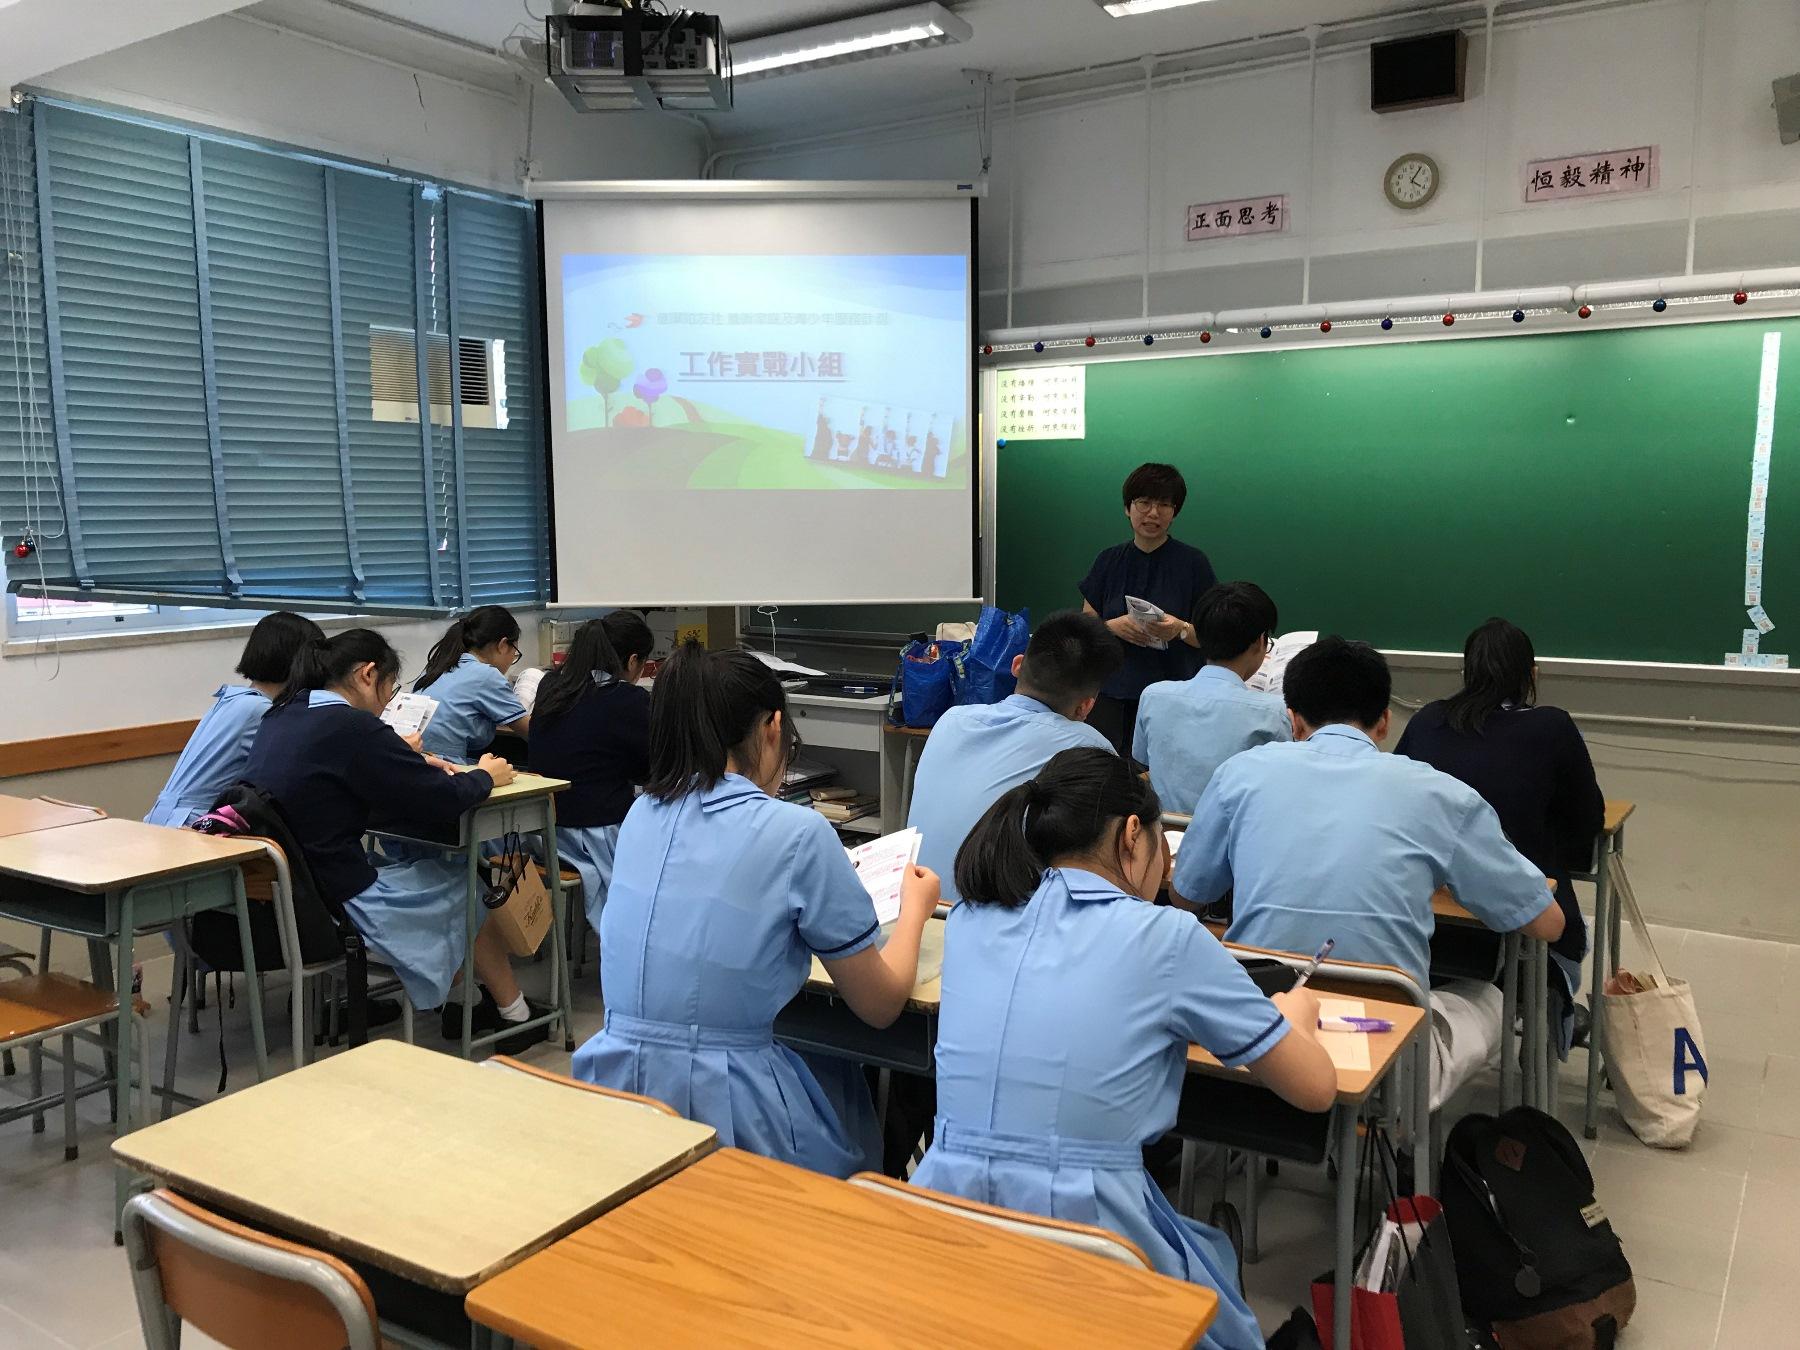 http://npc.edu.hk/sites/default/files/img_3915.jpg